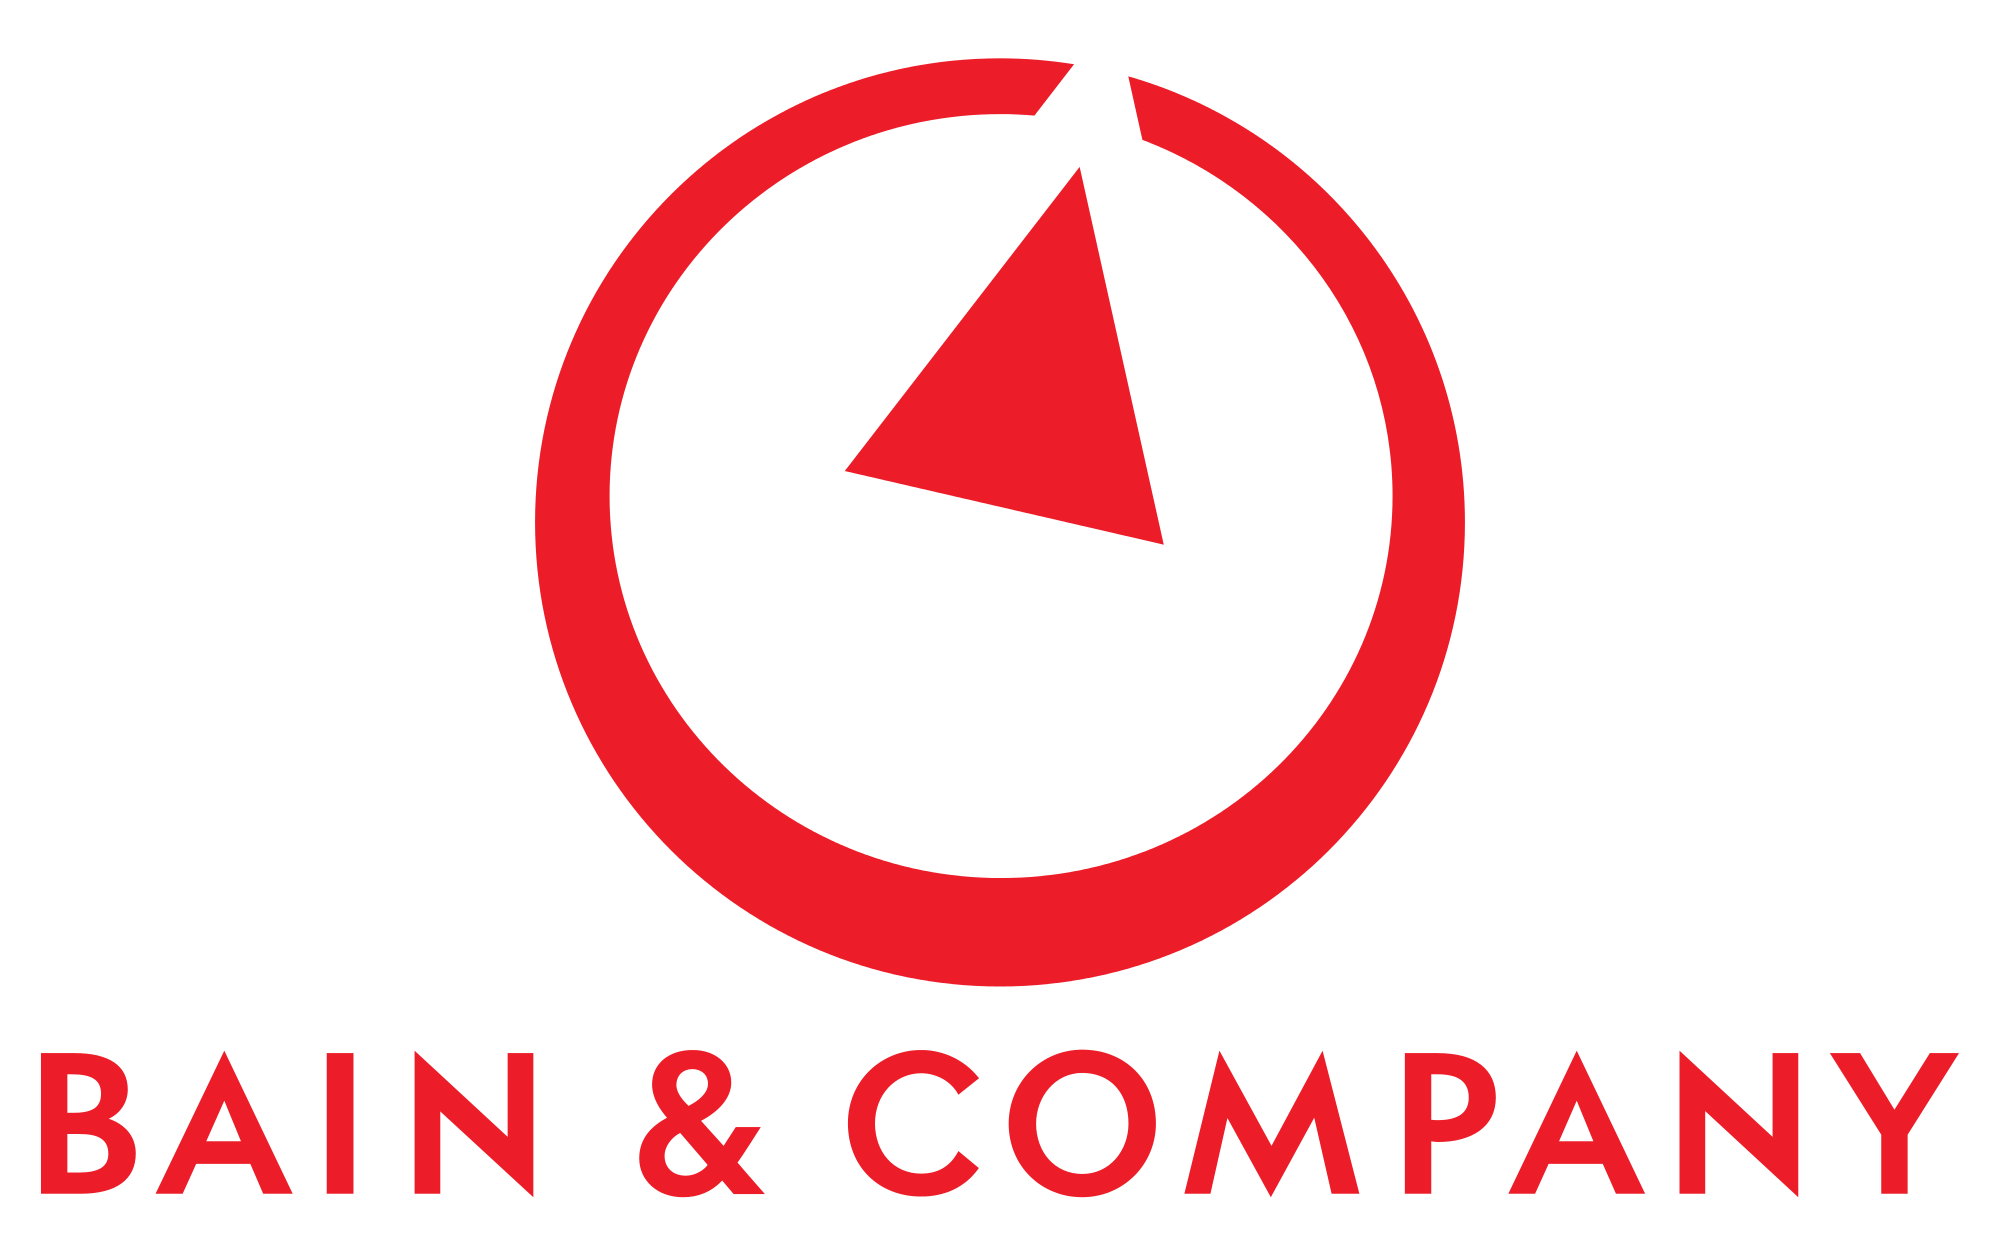 bain company. Resume Example. Resume CV Cover Letter